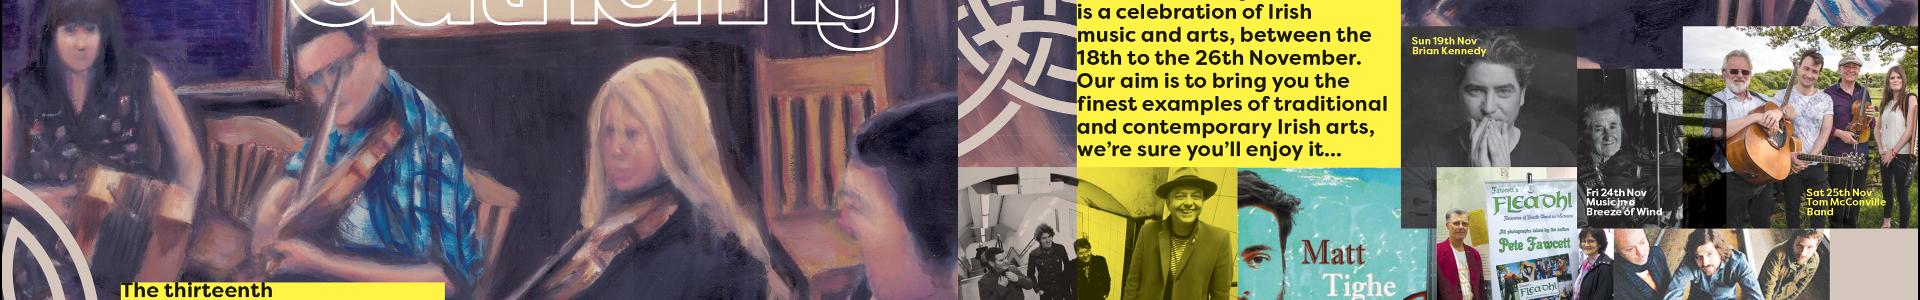 The Thirteenth Leeds Gathering